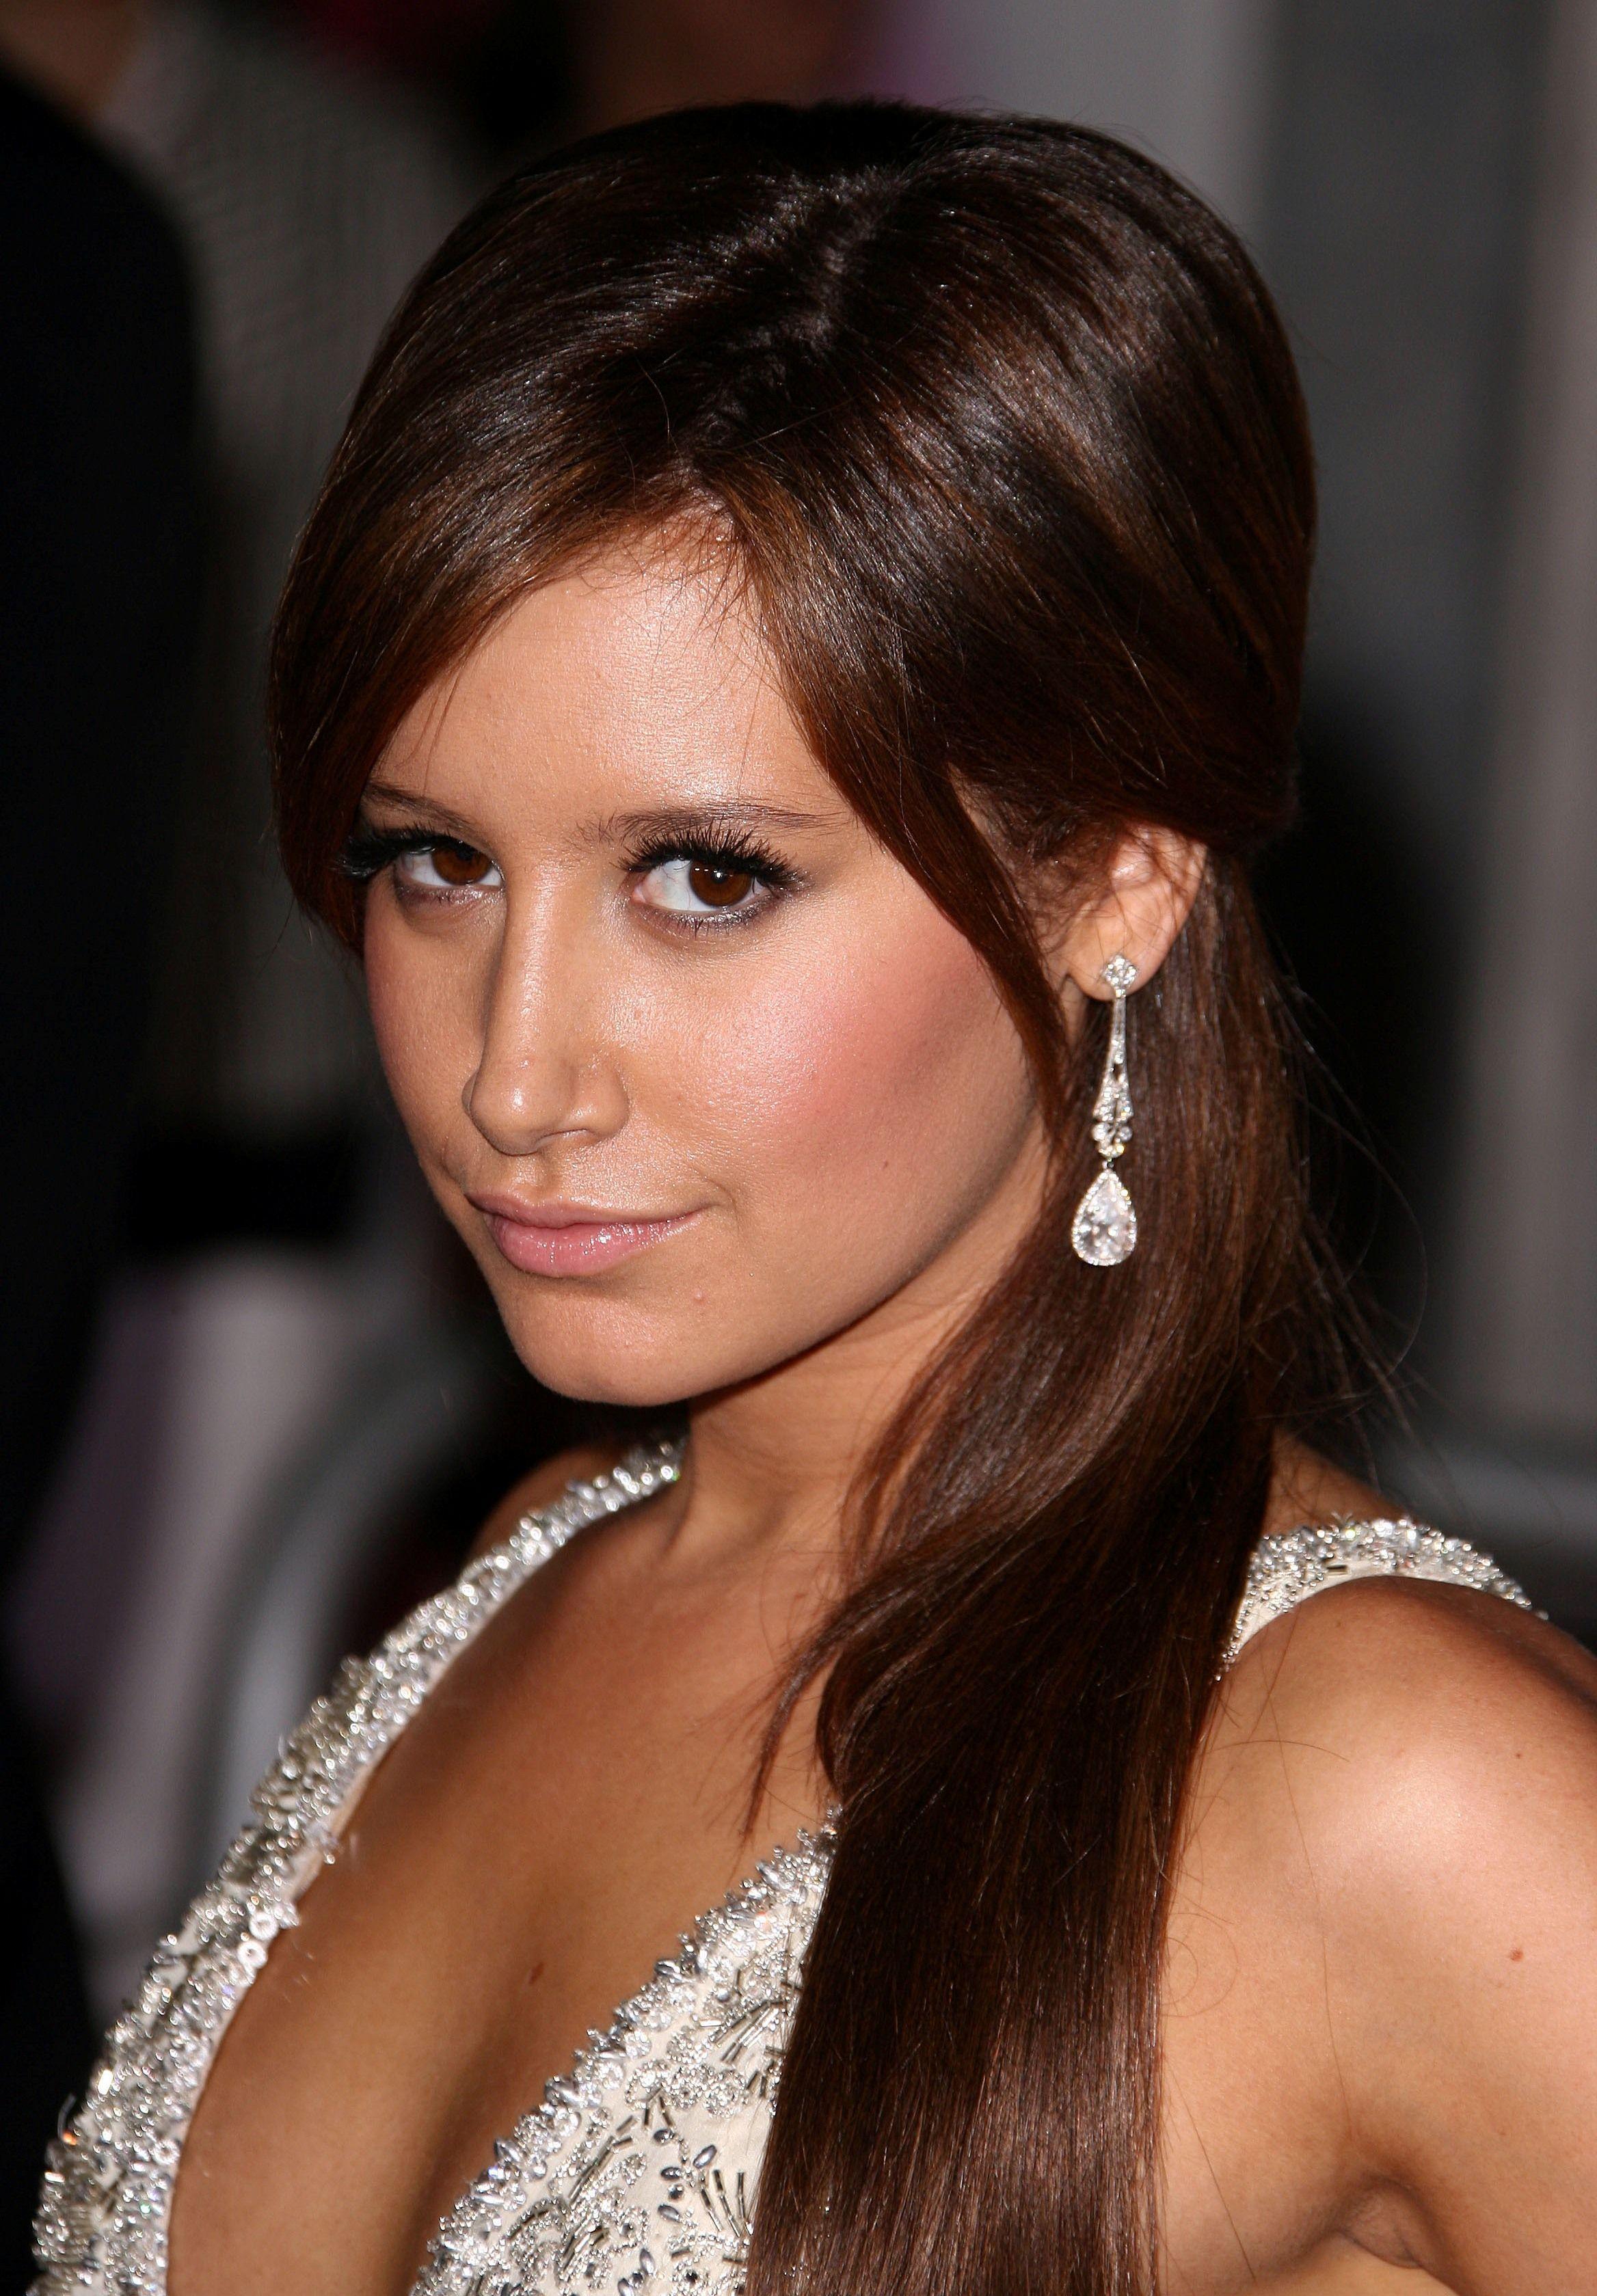 Marvelous 1000 Images About Hairstyles On Pinterest Dark Brown Subtle Short Hairstyles Gunalazisus